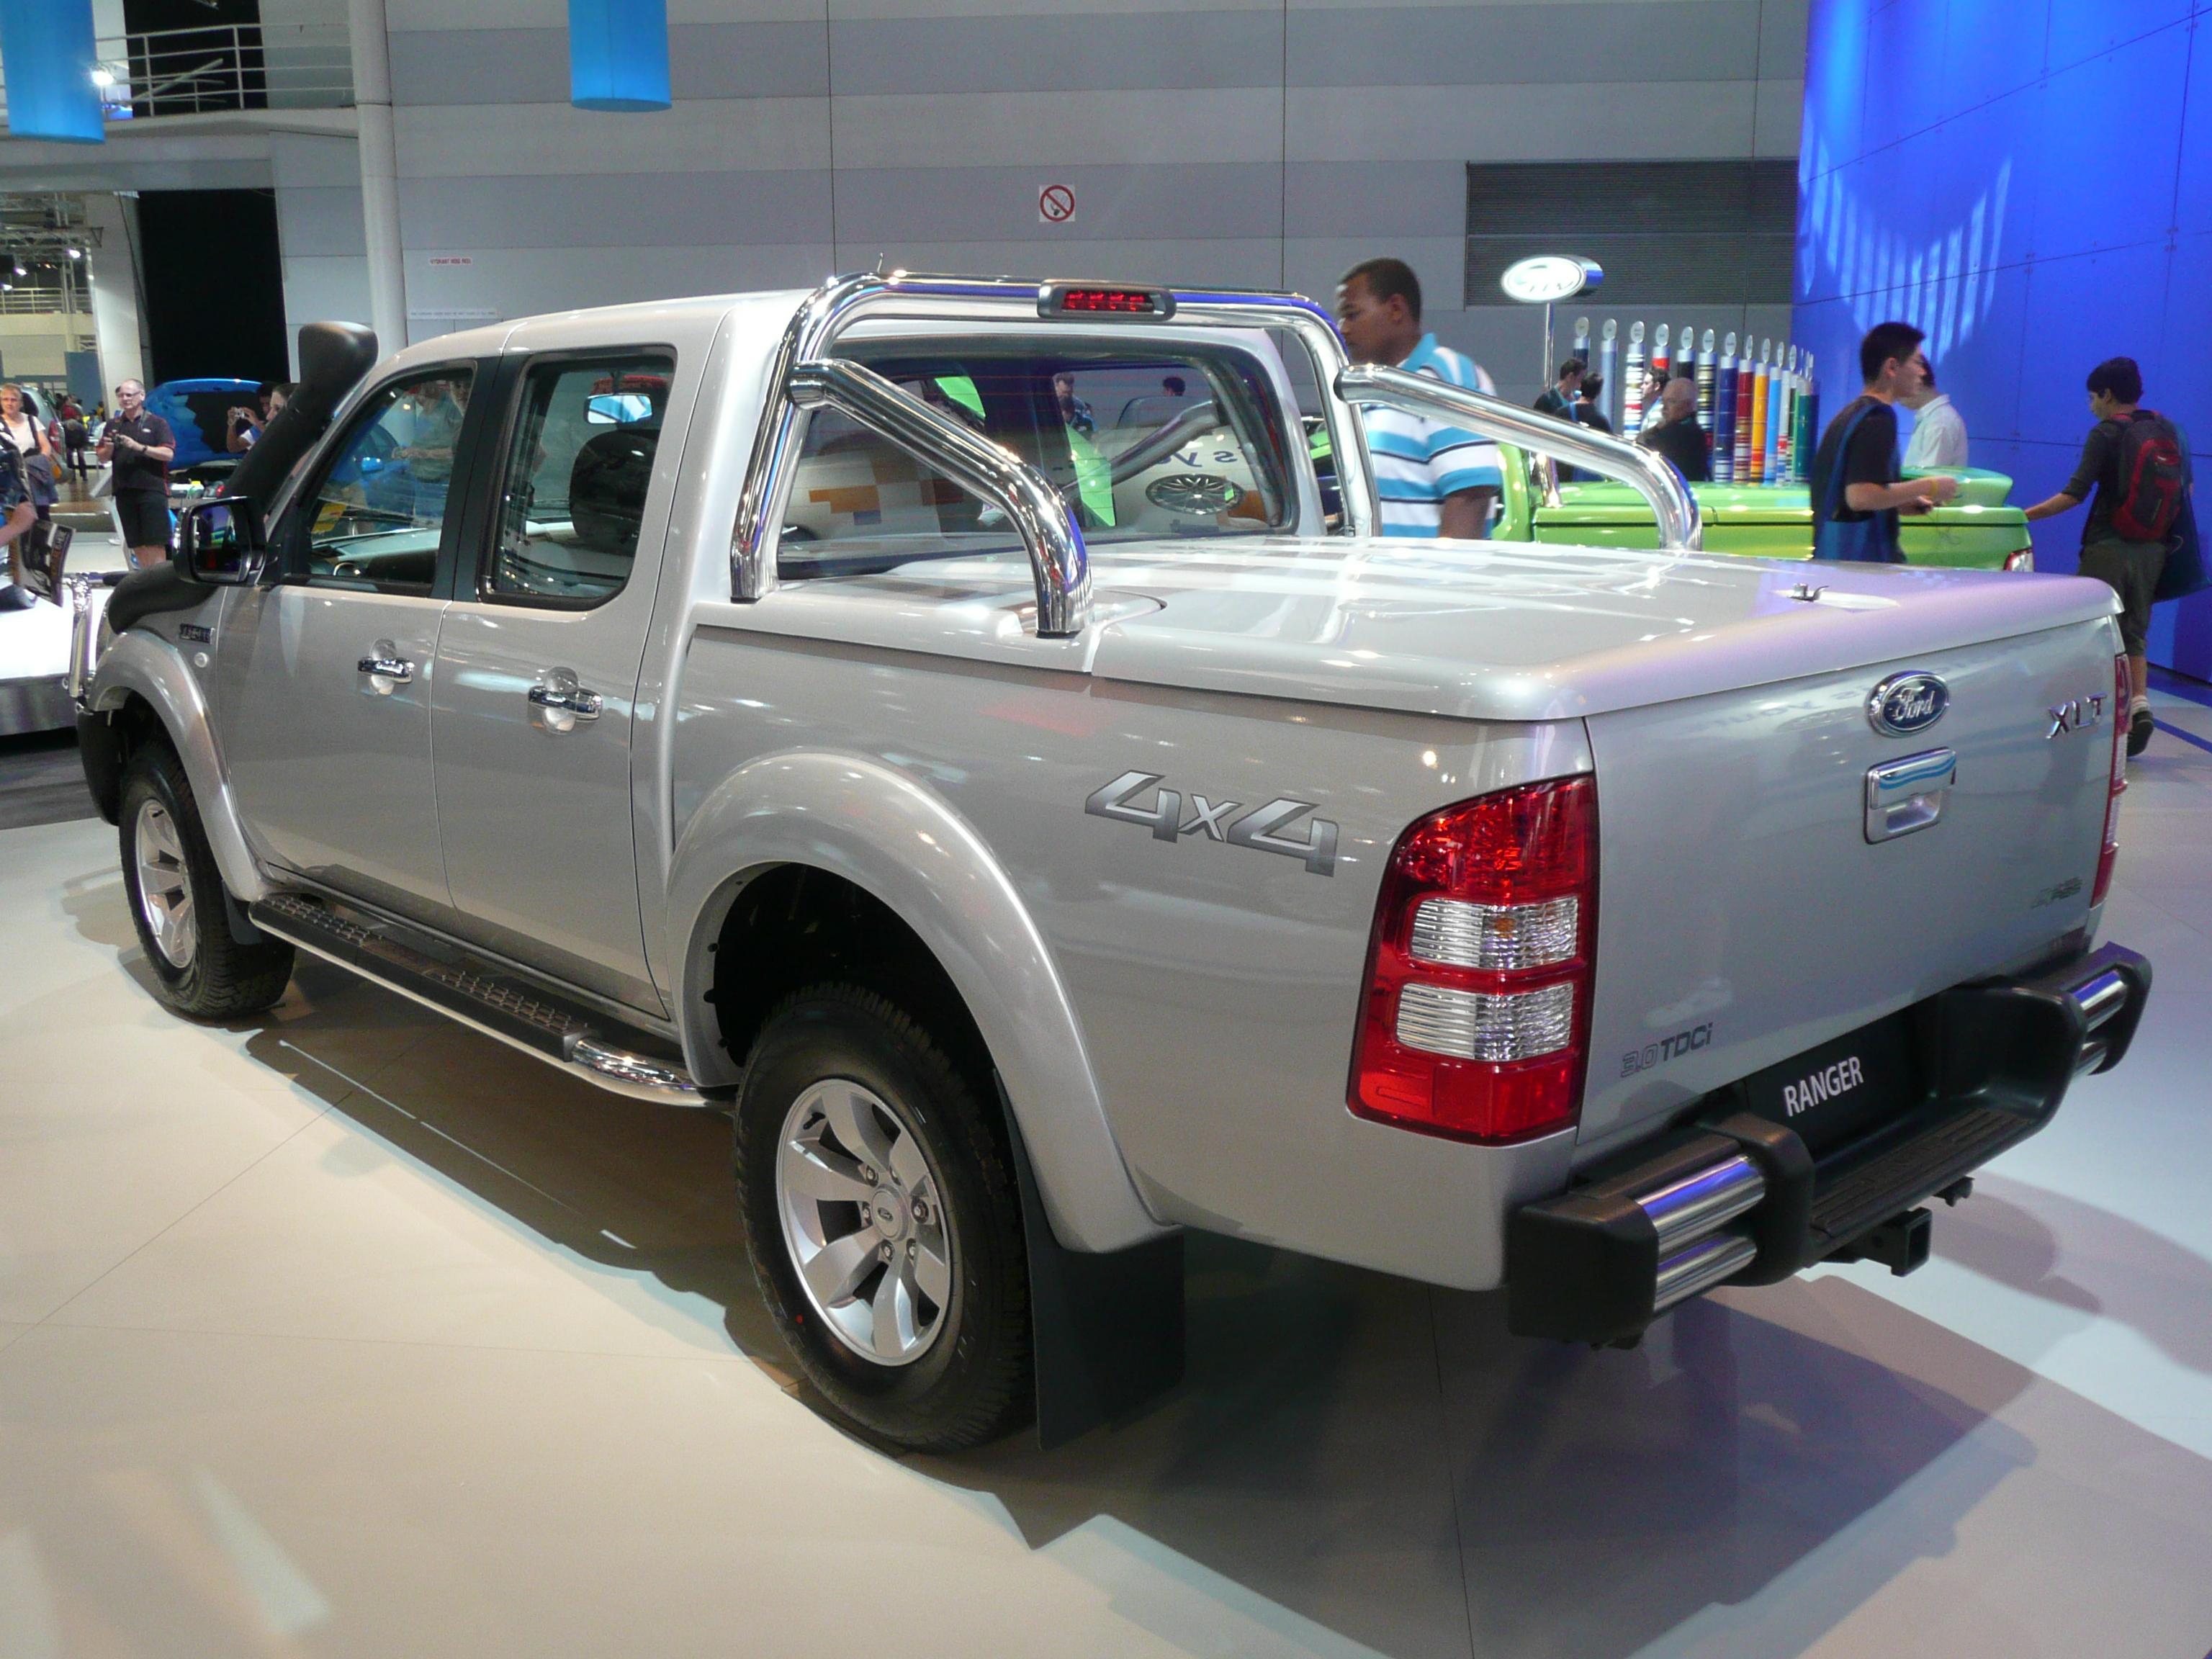 Chuck Kelly -- 2008 Ford Ranger XLT